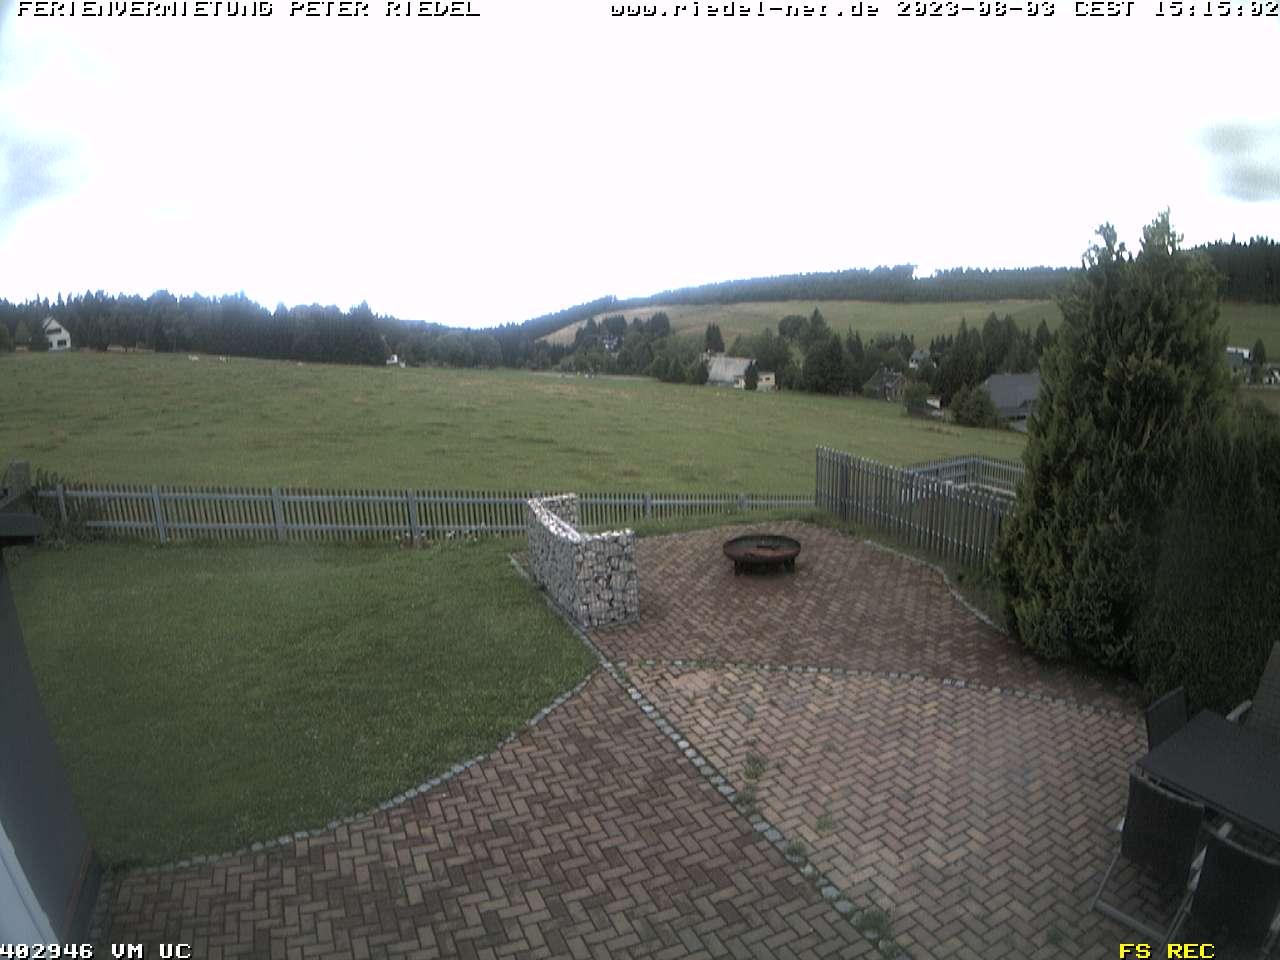 Webcam Skigebiet Oberwiesenthal Tellerh�user - Erzgebirge